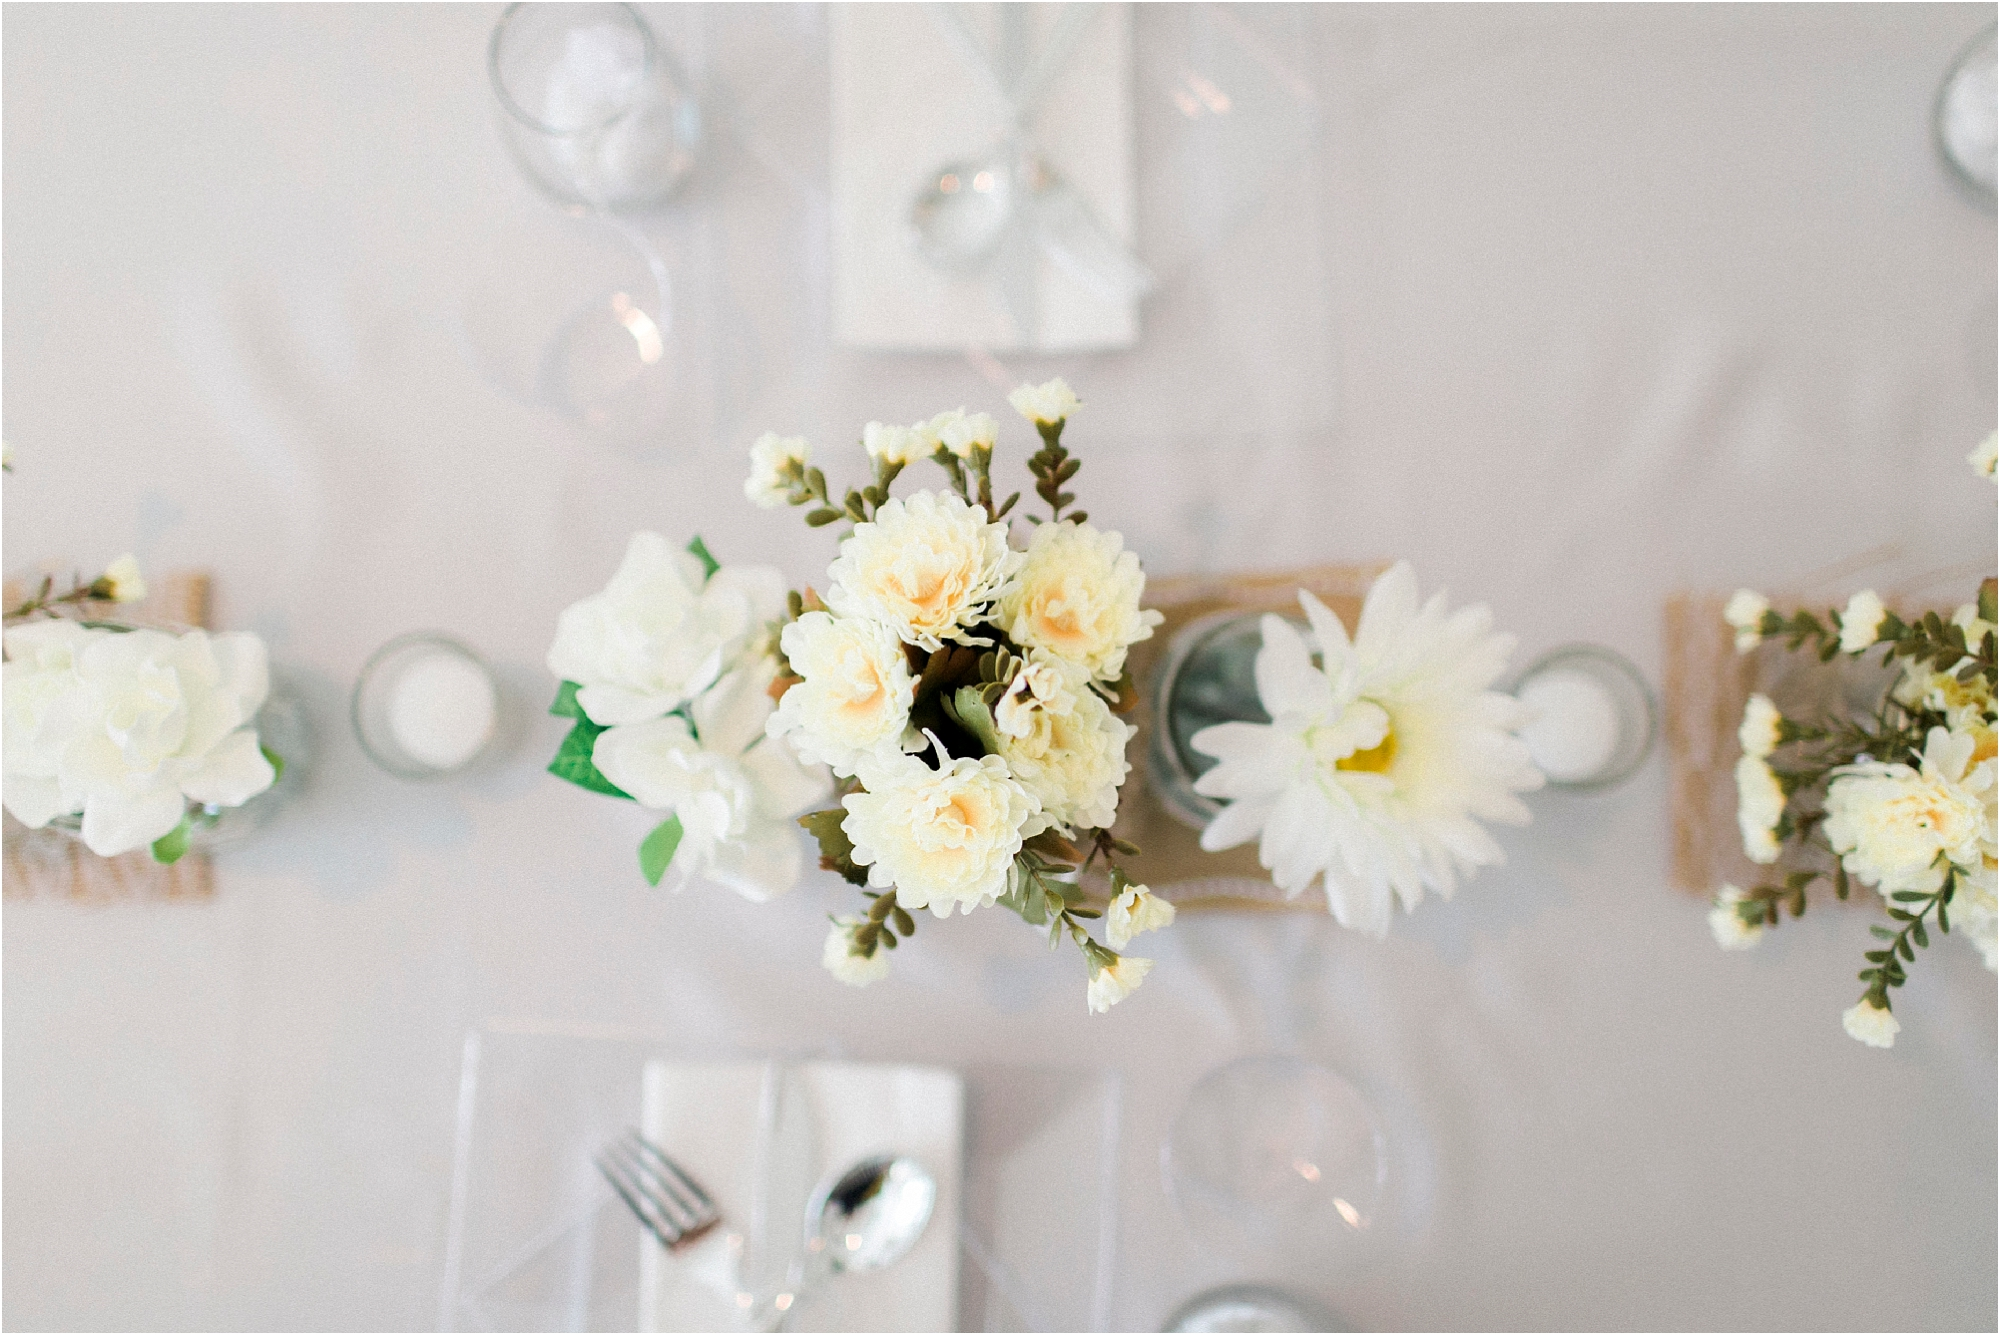 inimate-richmond-virginia-backyard-summer-wedding-photos_0014.jpg